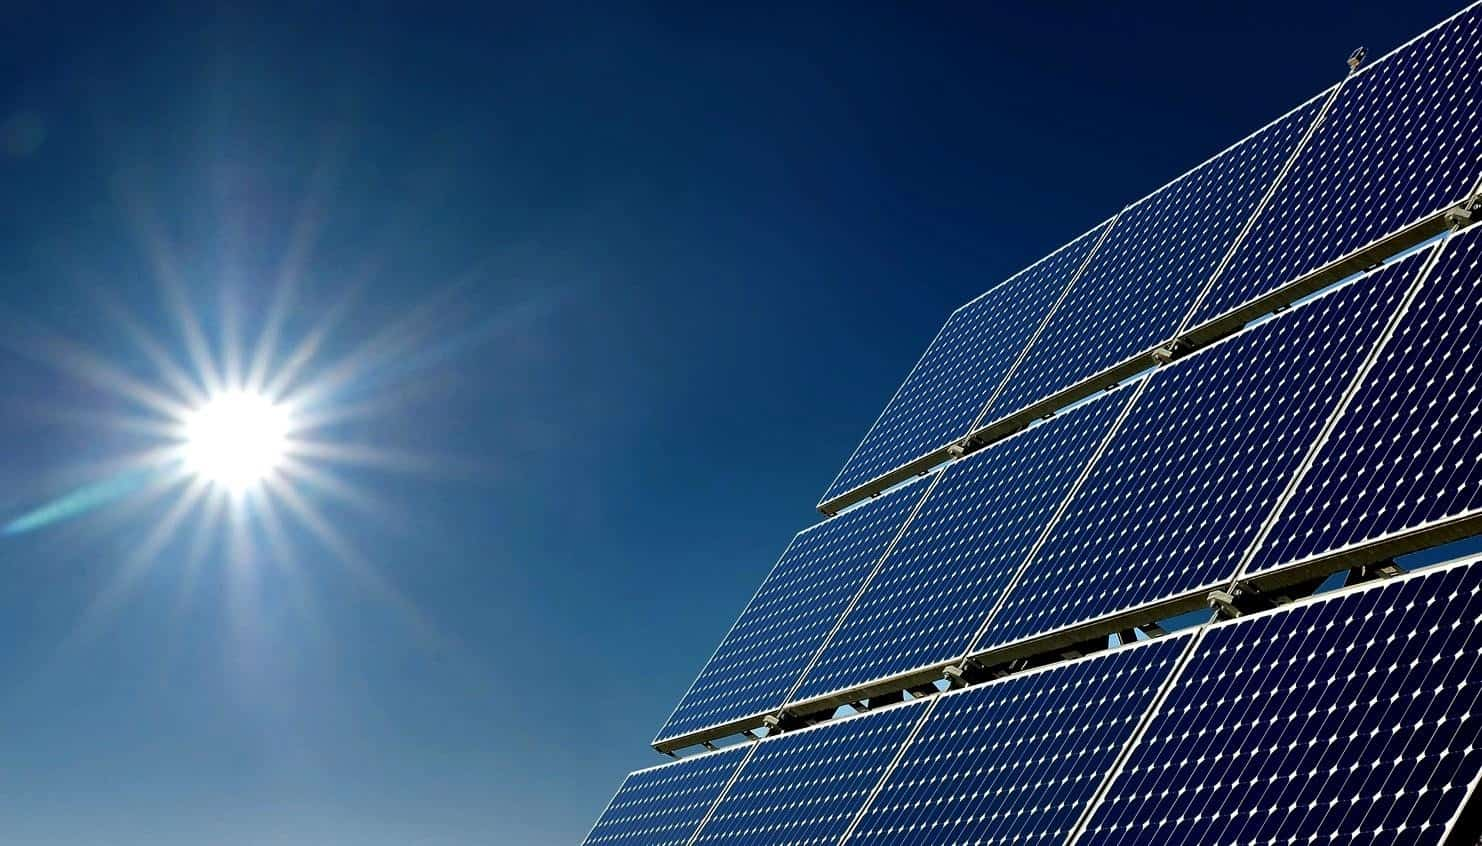 energia solar vantagens e desvantagens